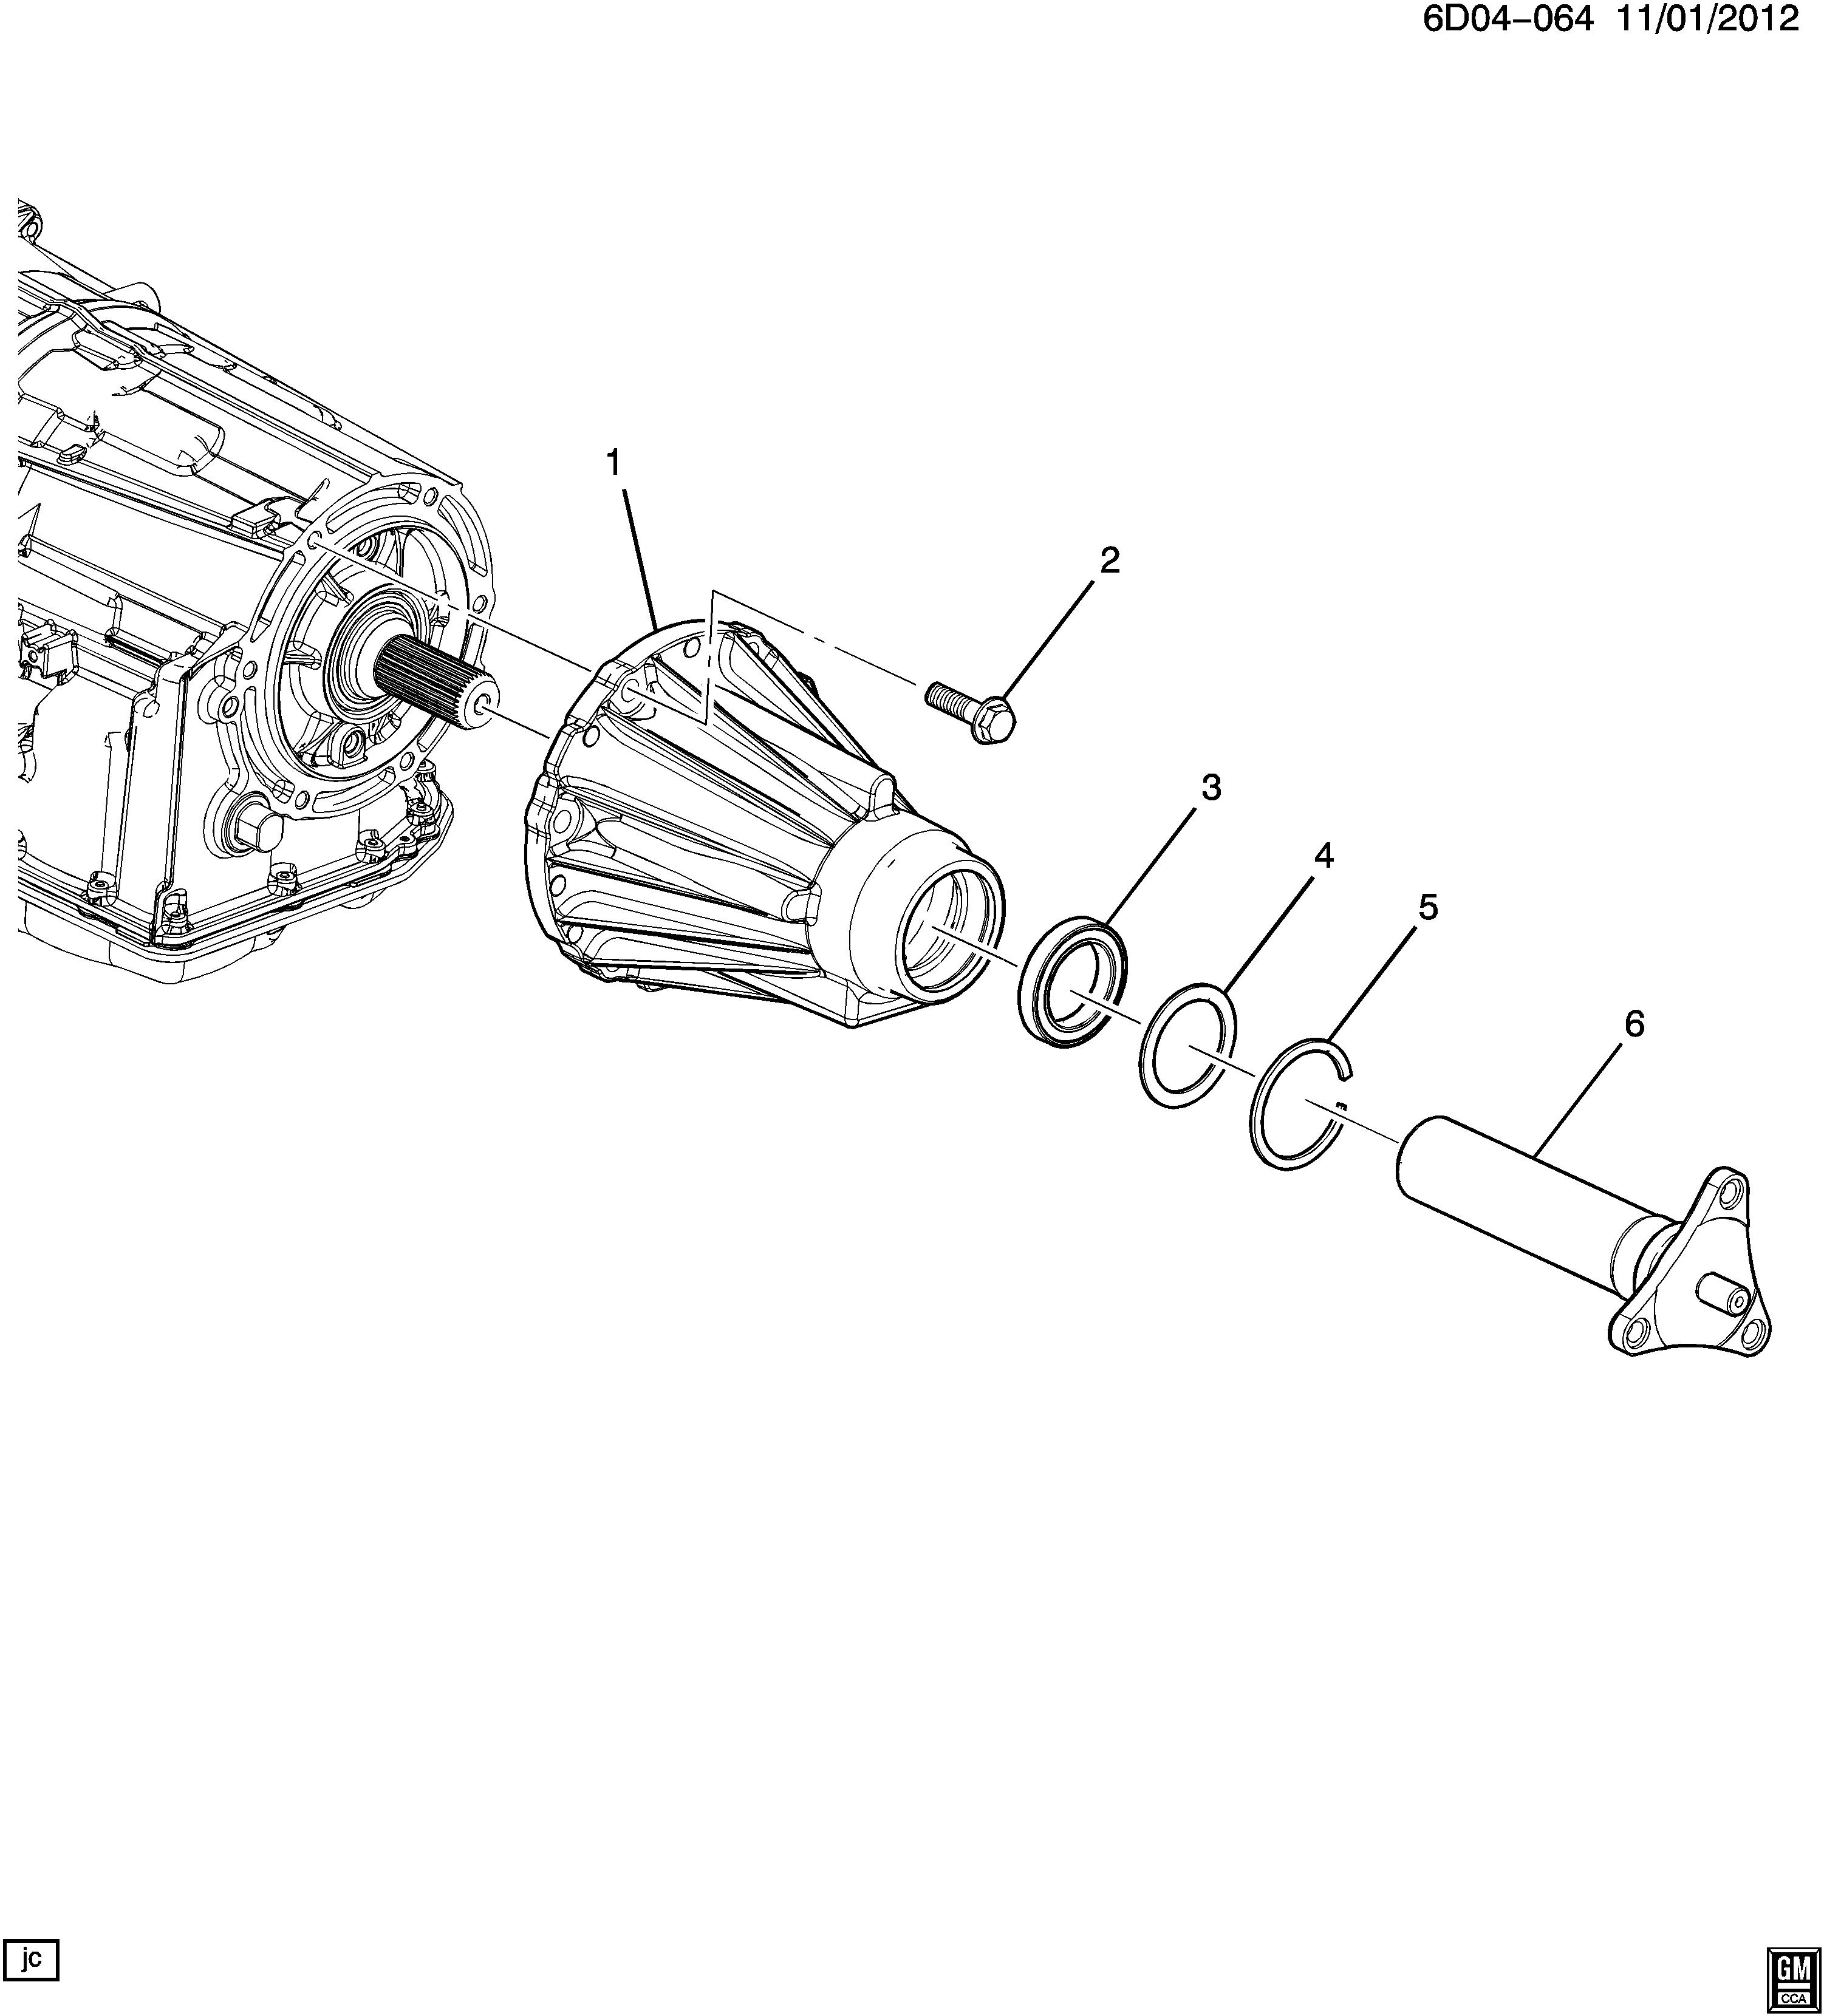 Cadillac STS - DX29 AUTOMATIC TRANSMISSION (MYC) (6L80) CASE